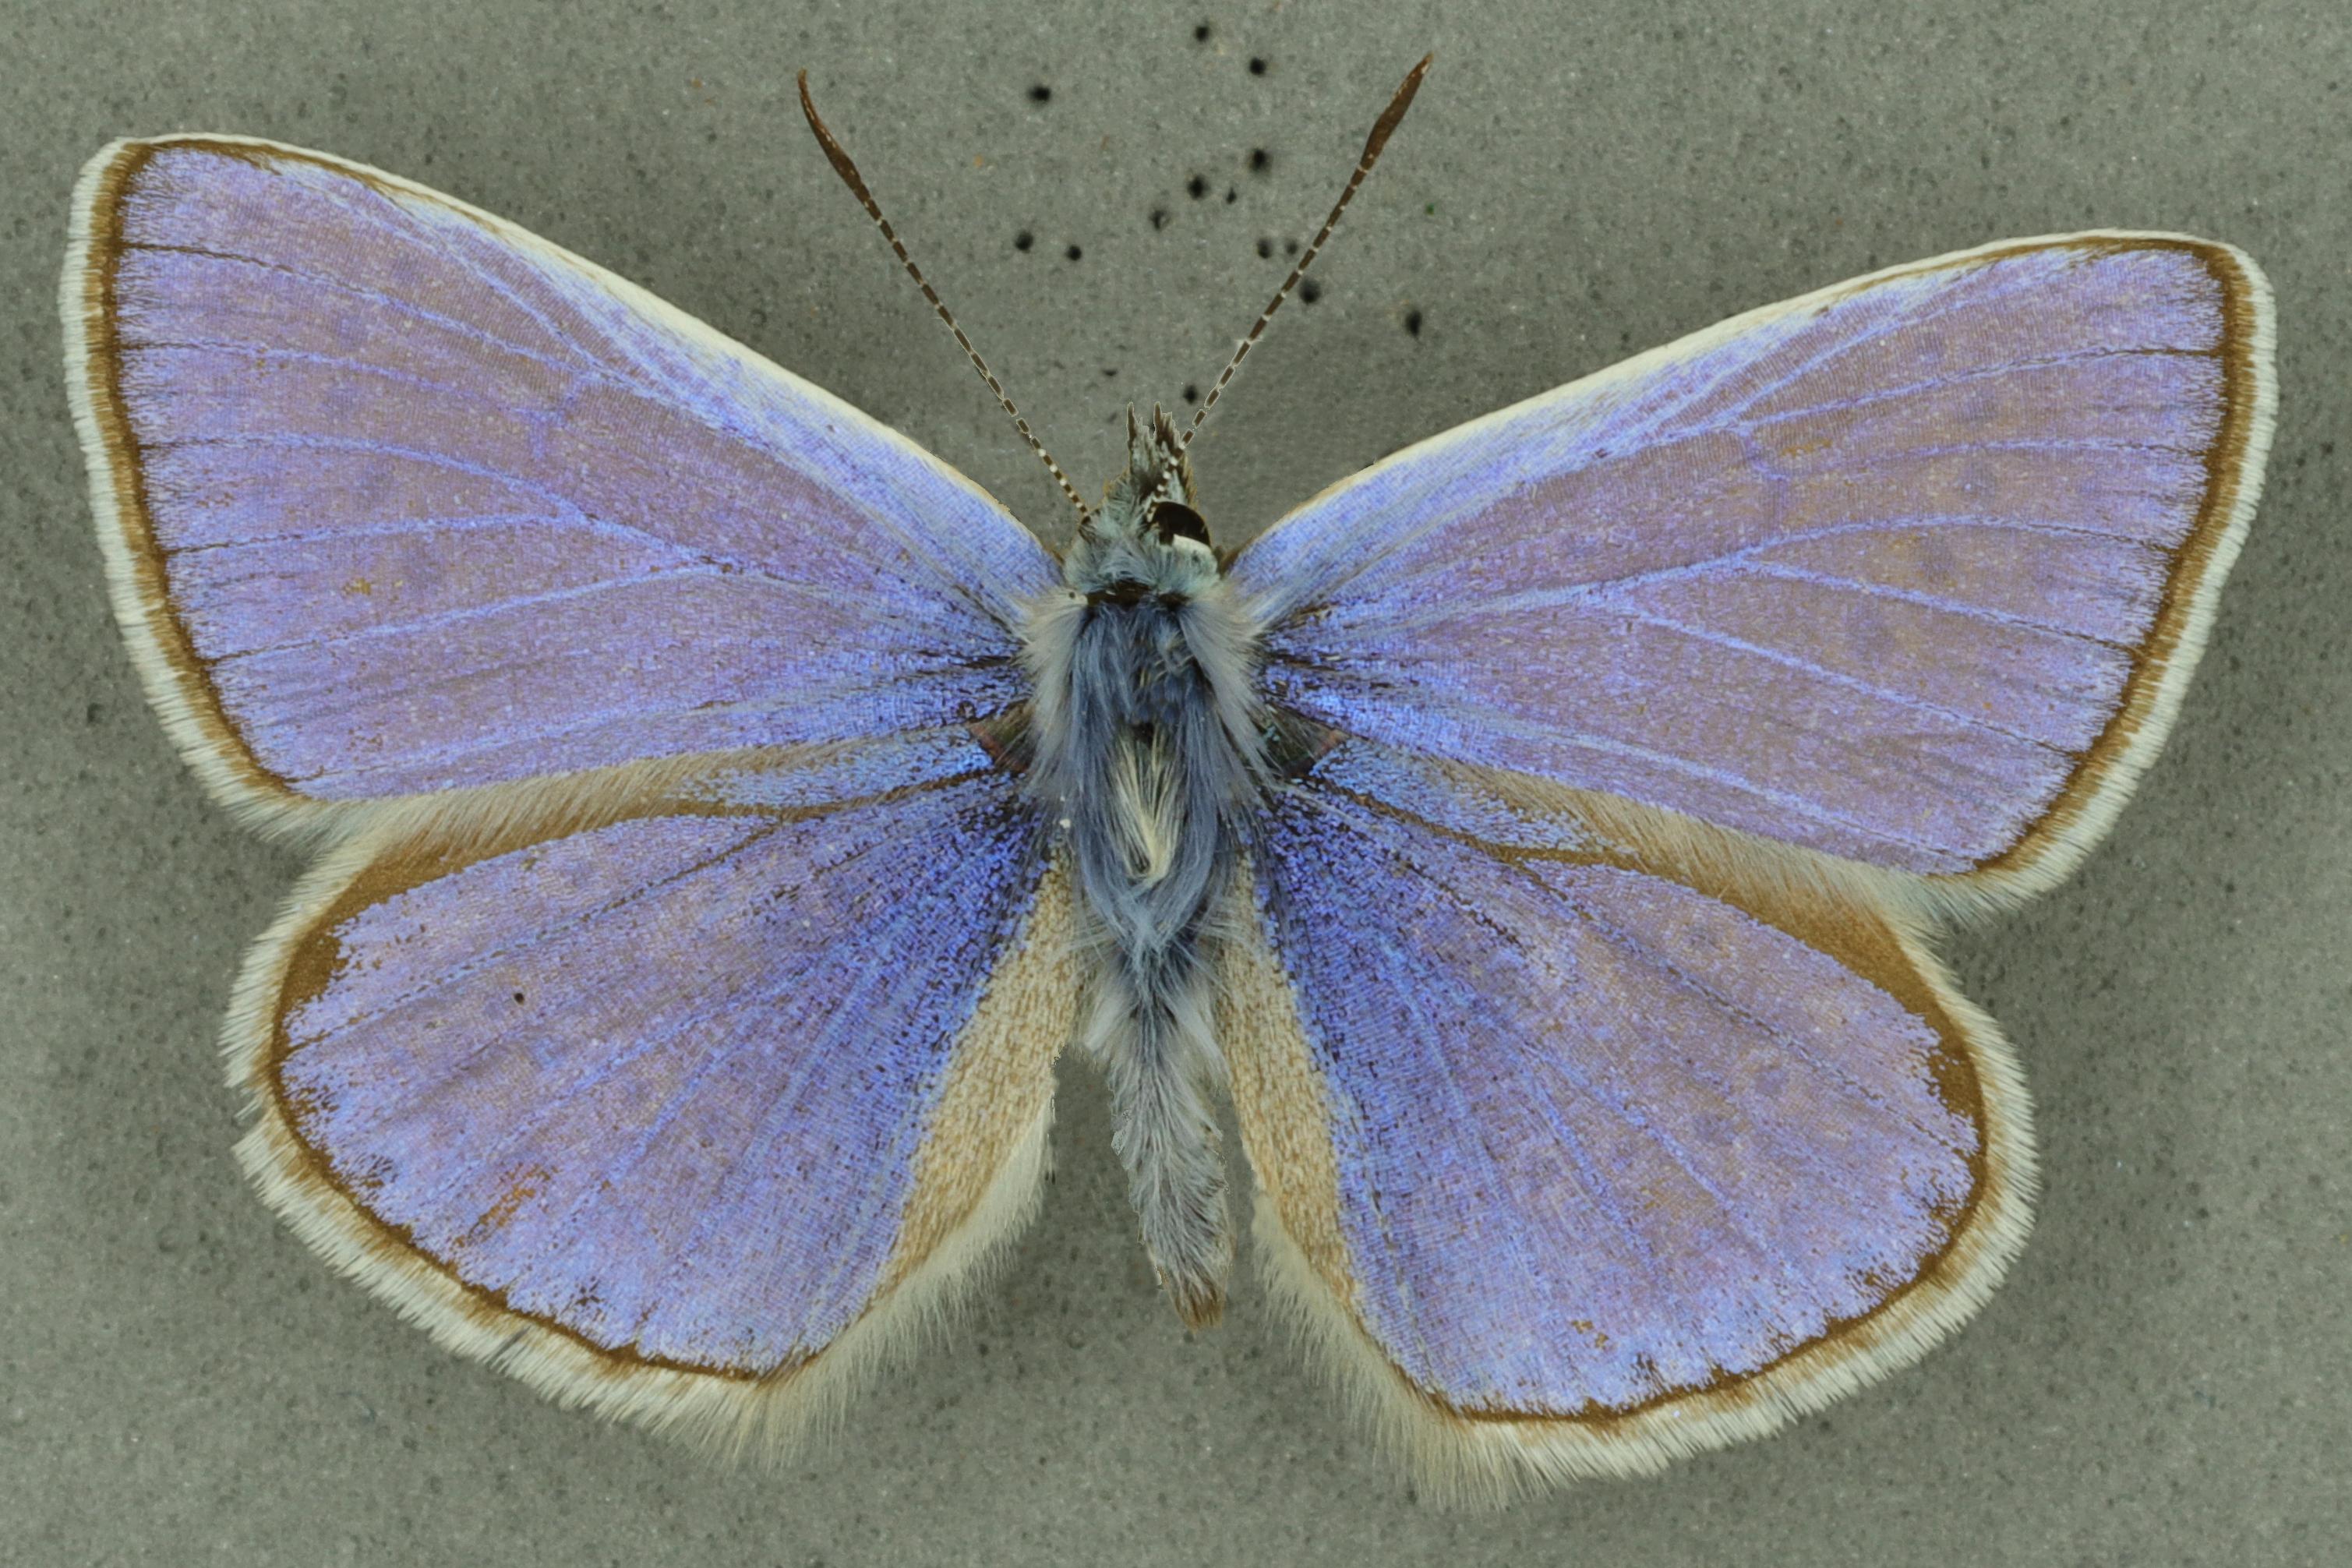 Common Blue, University Museum of Zoology collection, copyright University of Cambridge